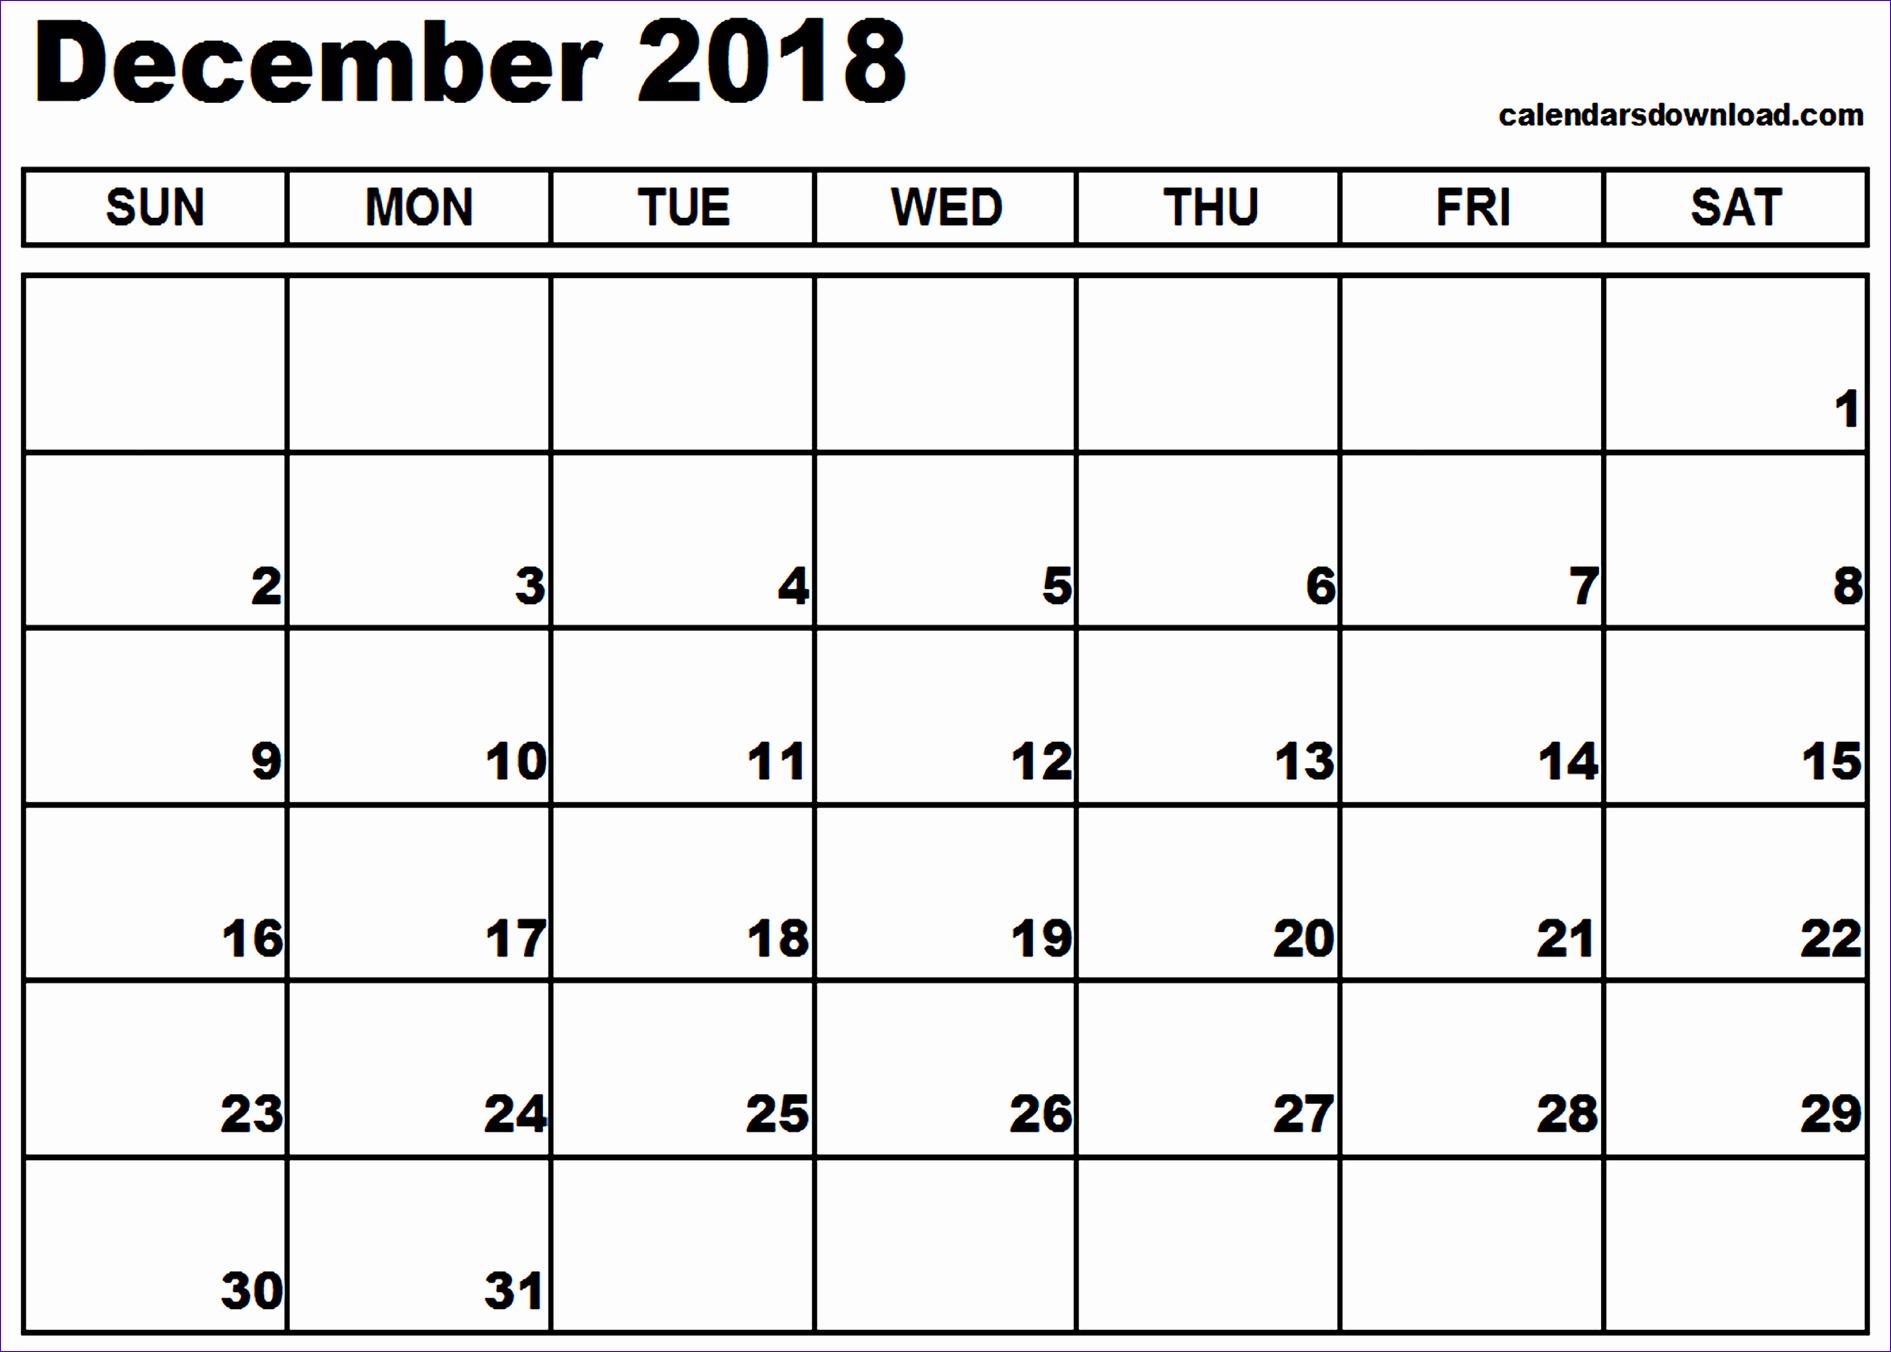 december 2018 calendar 1052 18911352